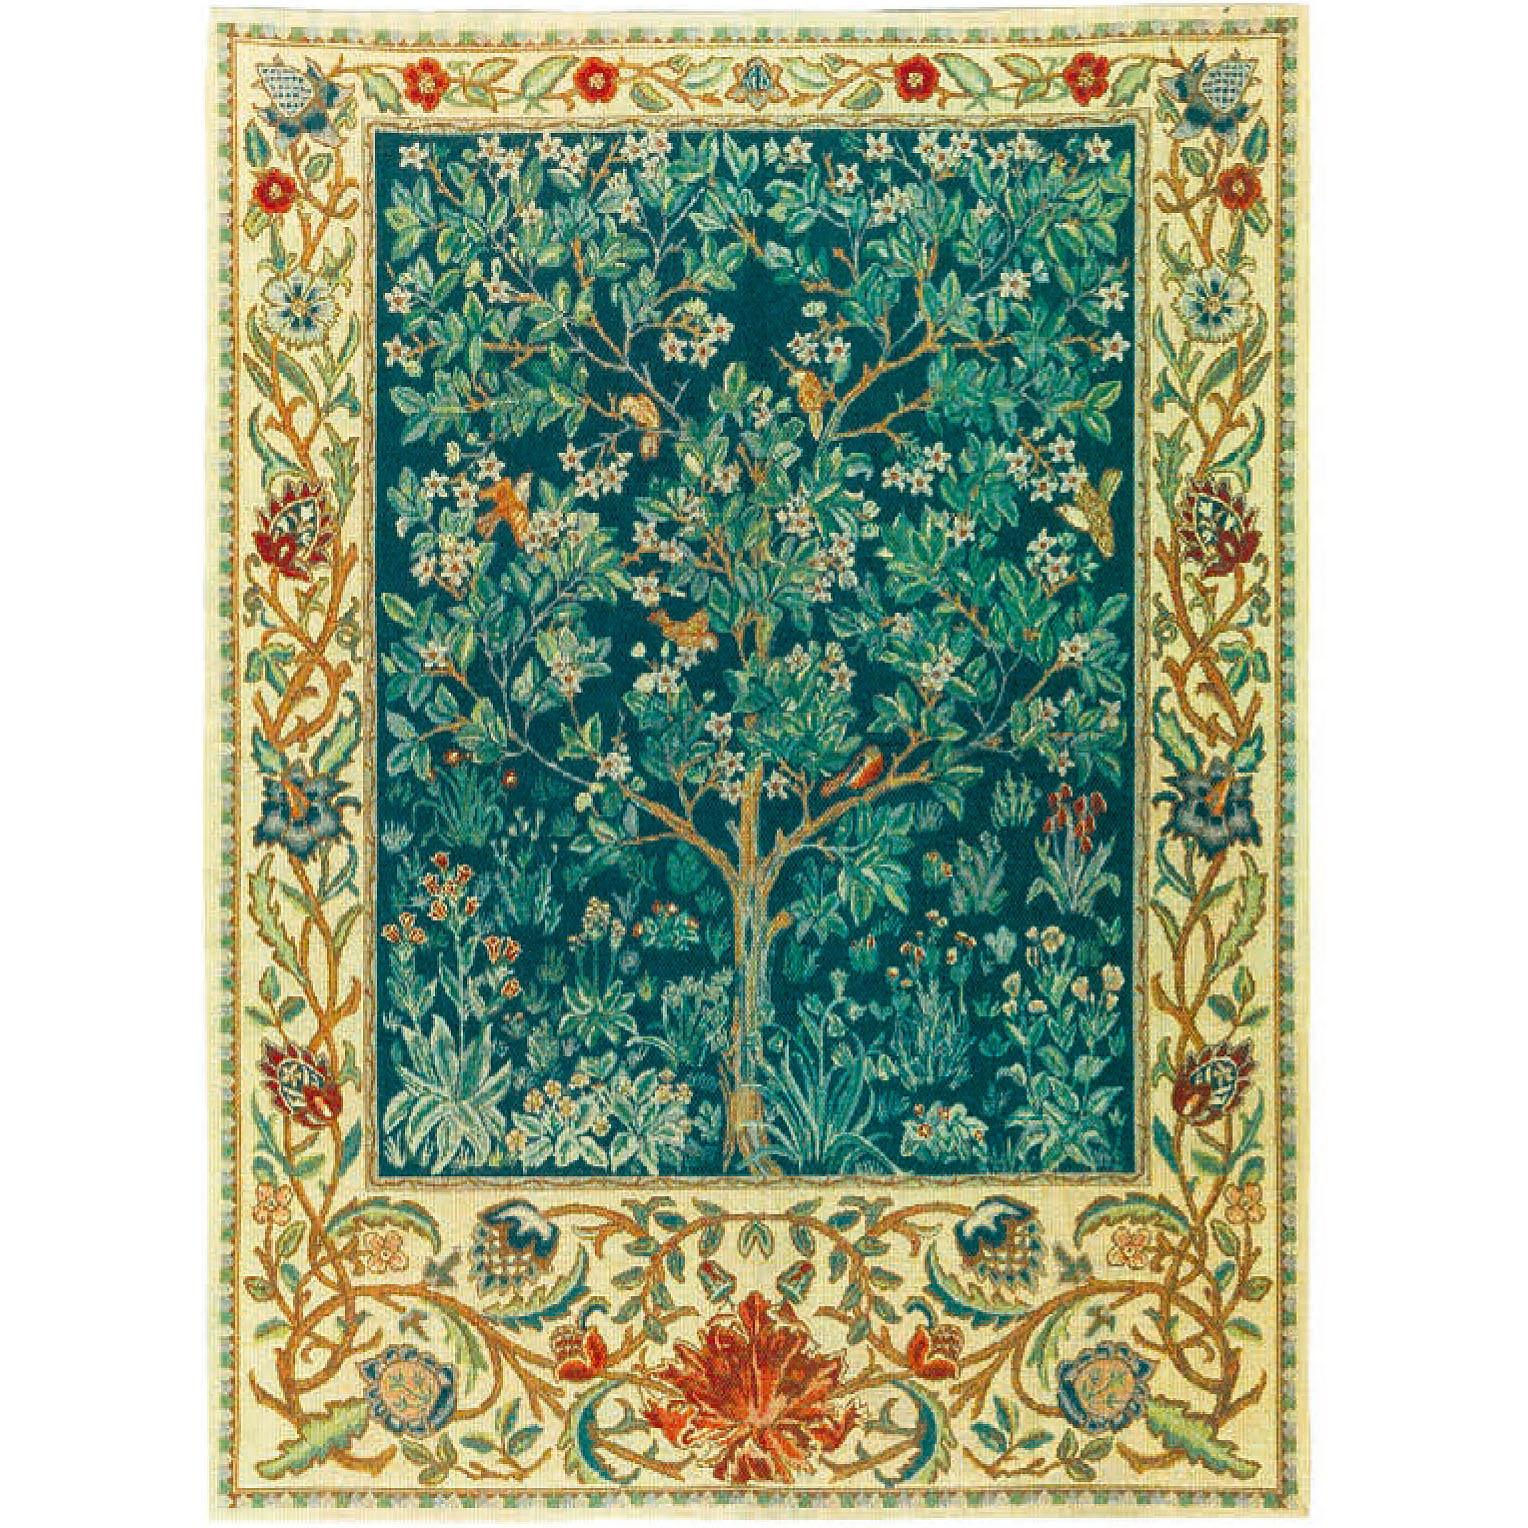 Luka, T1642 Tree of Live х Blau <br> Гобелен Дерево жизни Густав Климт <br> размеры 068х105, 085х120, 130х178, 178х235